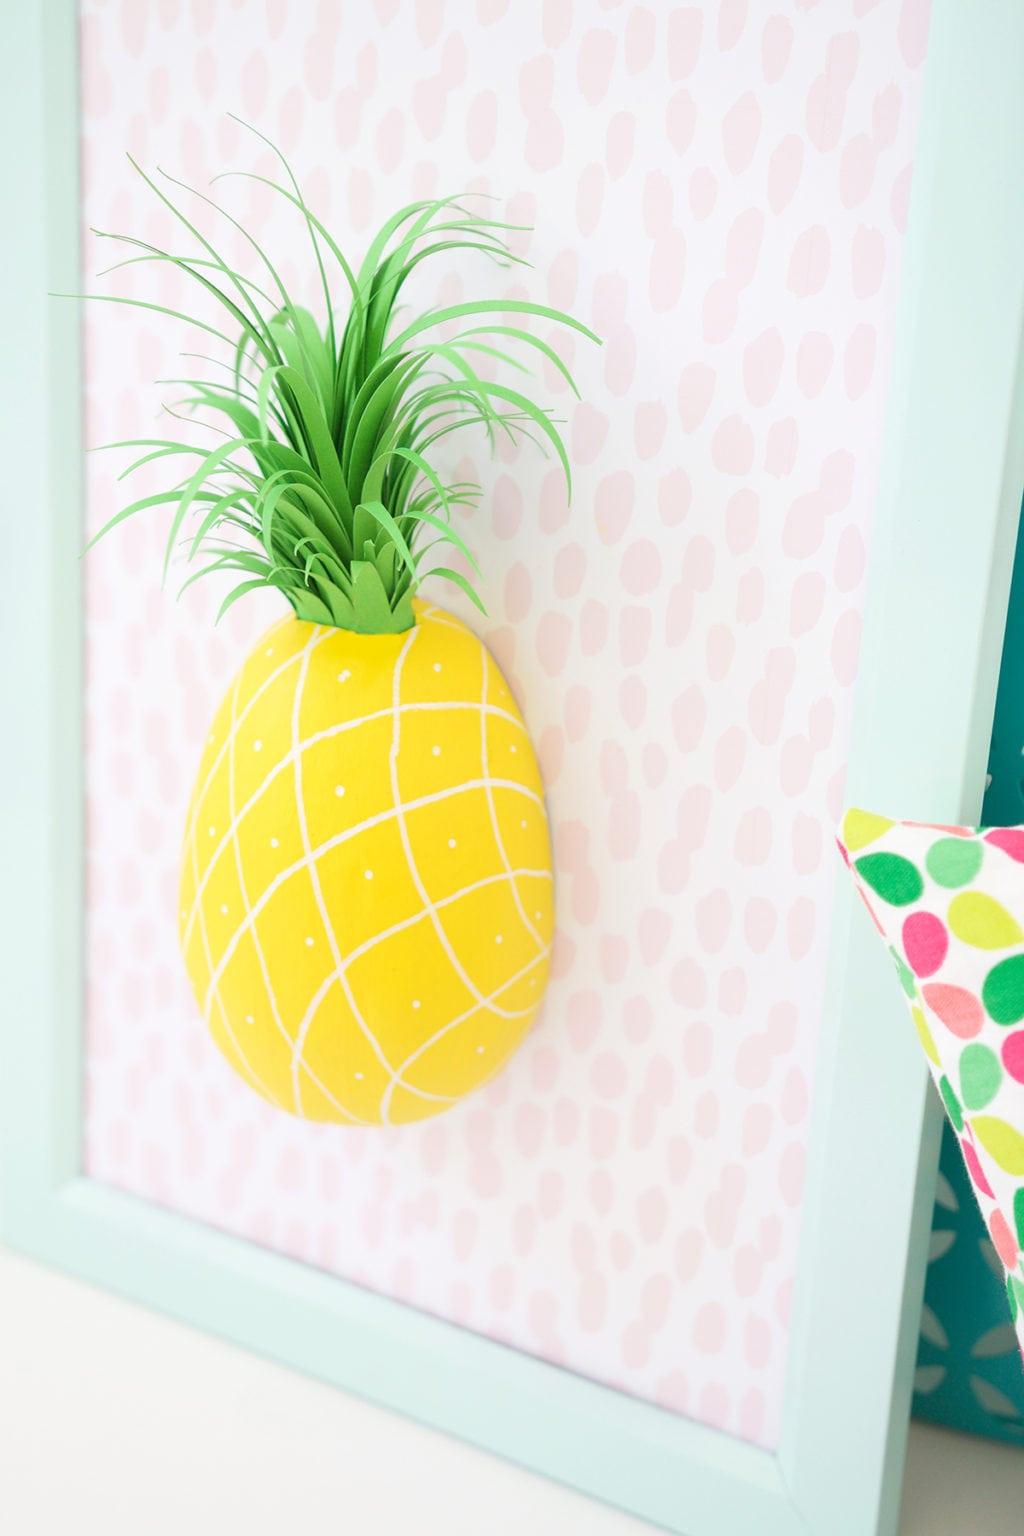 DIY Paper Mache Pineapple Wall Art - Damask Love